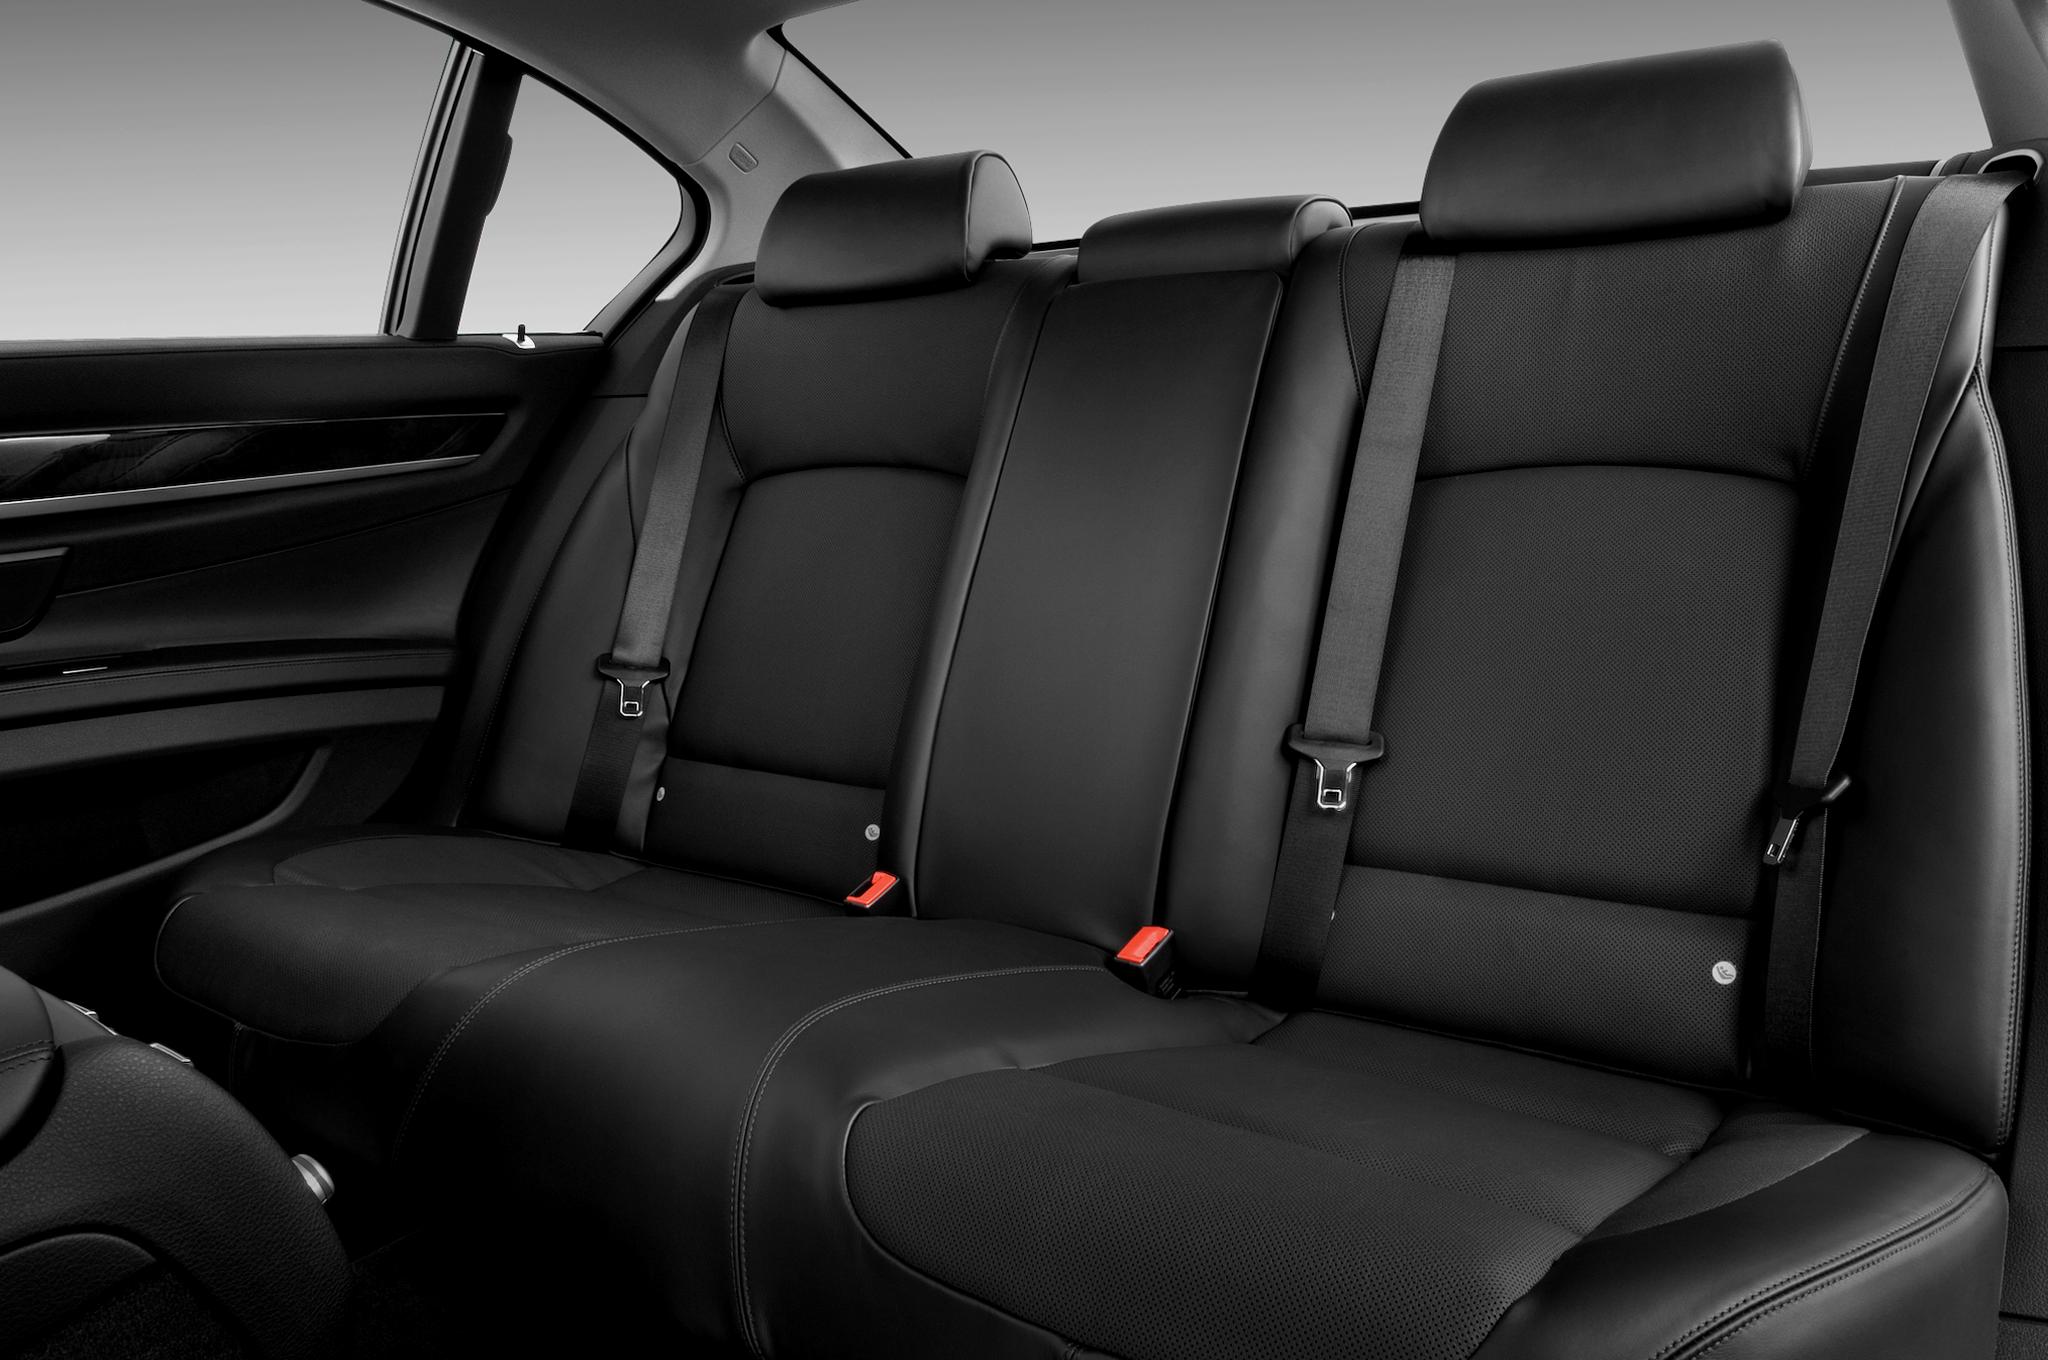 BMW 7-Series Interior Back Seats View Chauffeured Car Services Minneapolis MN / St Paul Minnesota